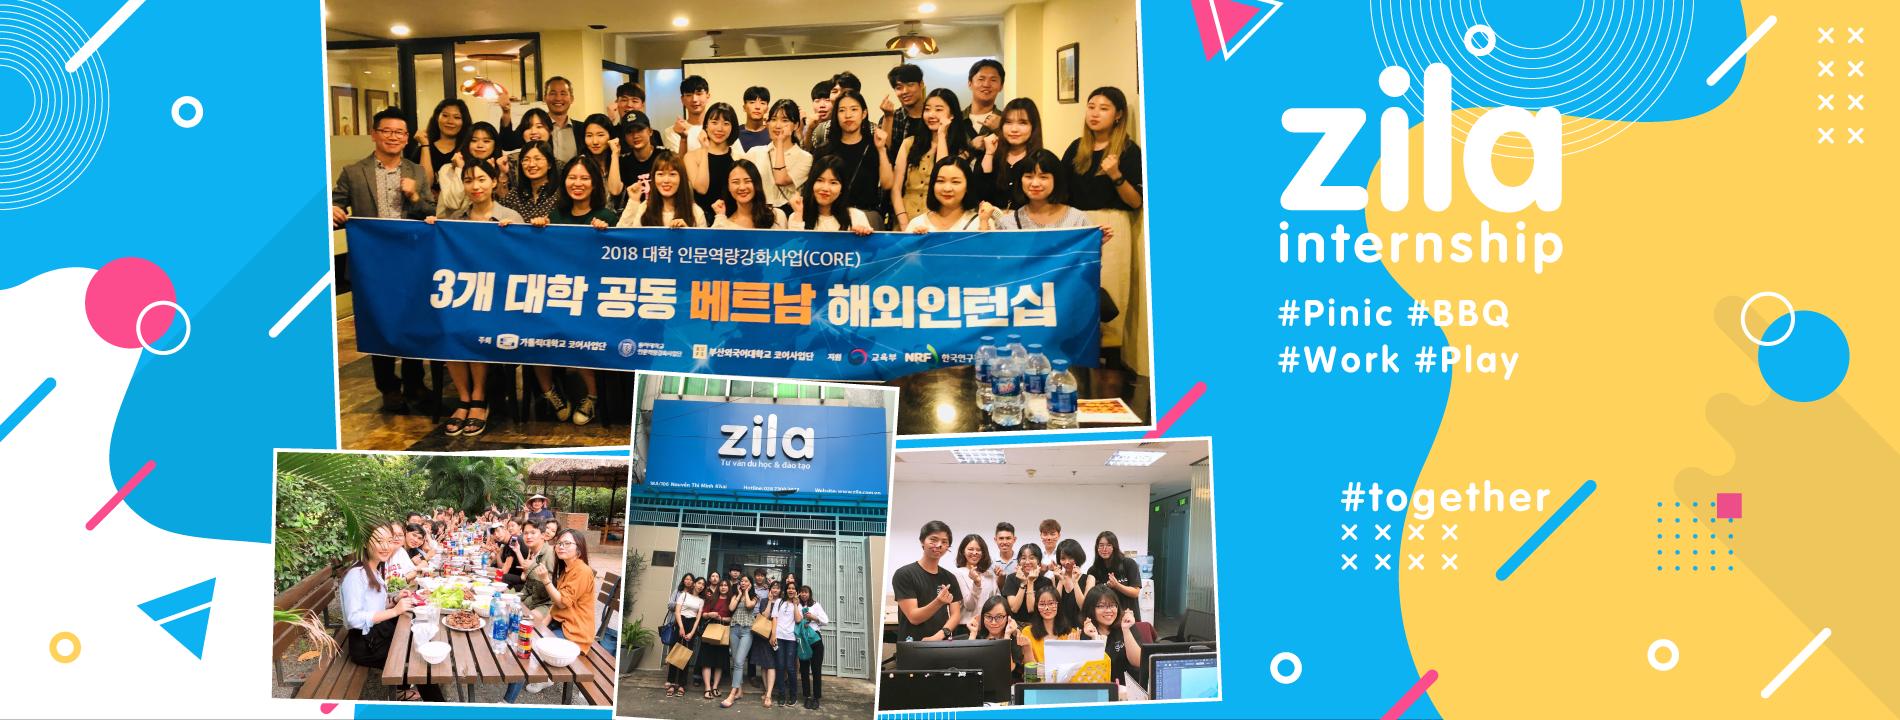 zila-internship-korean